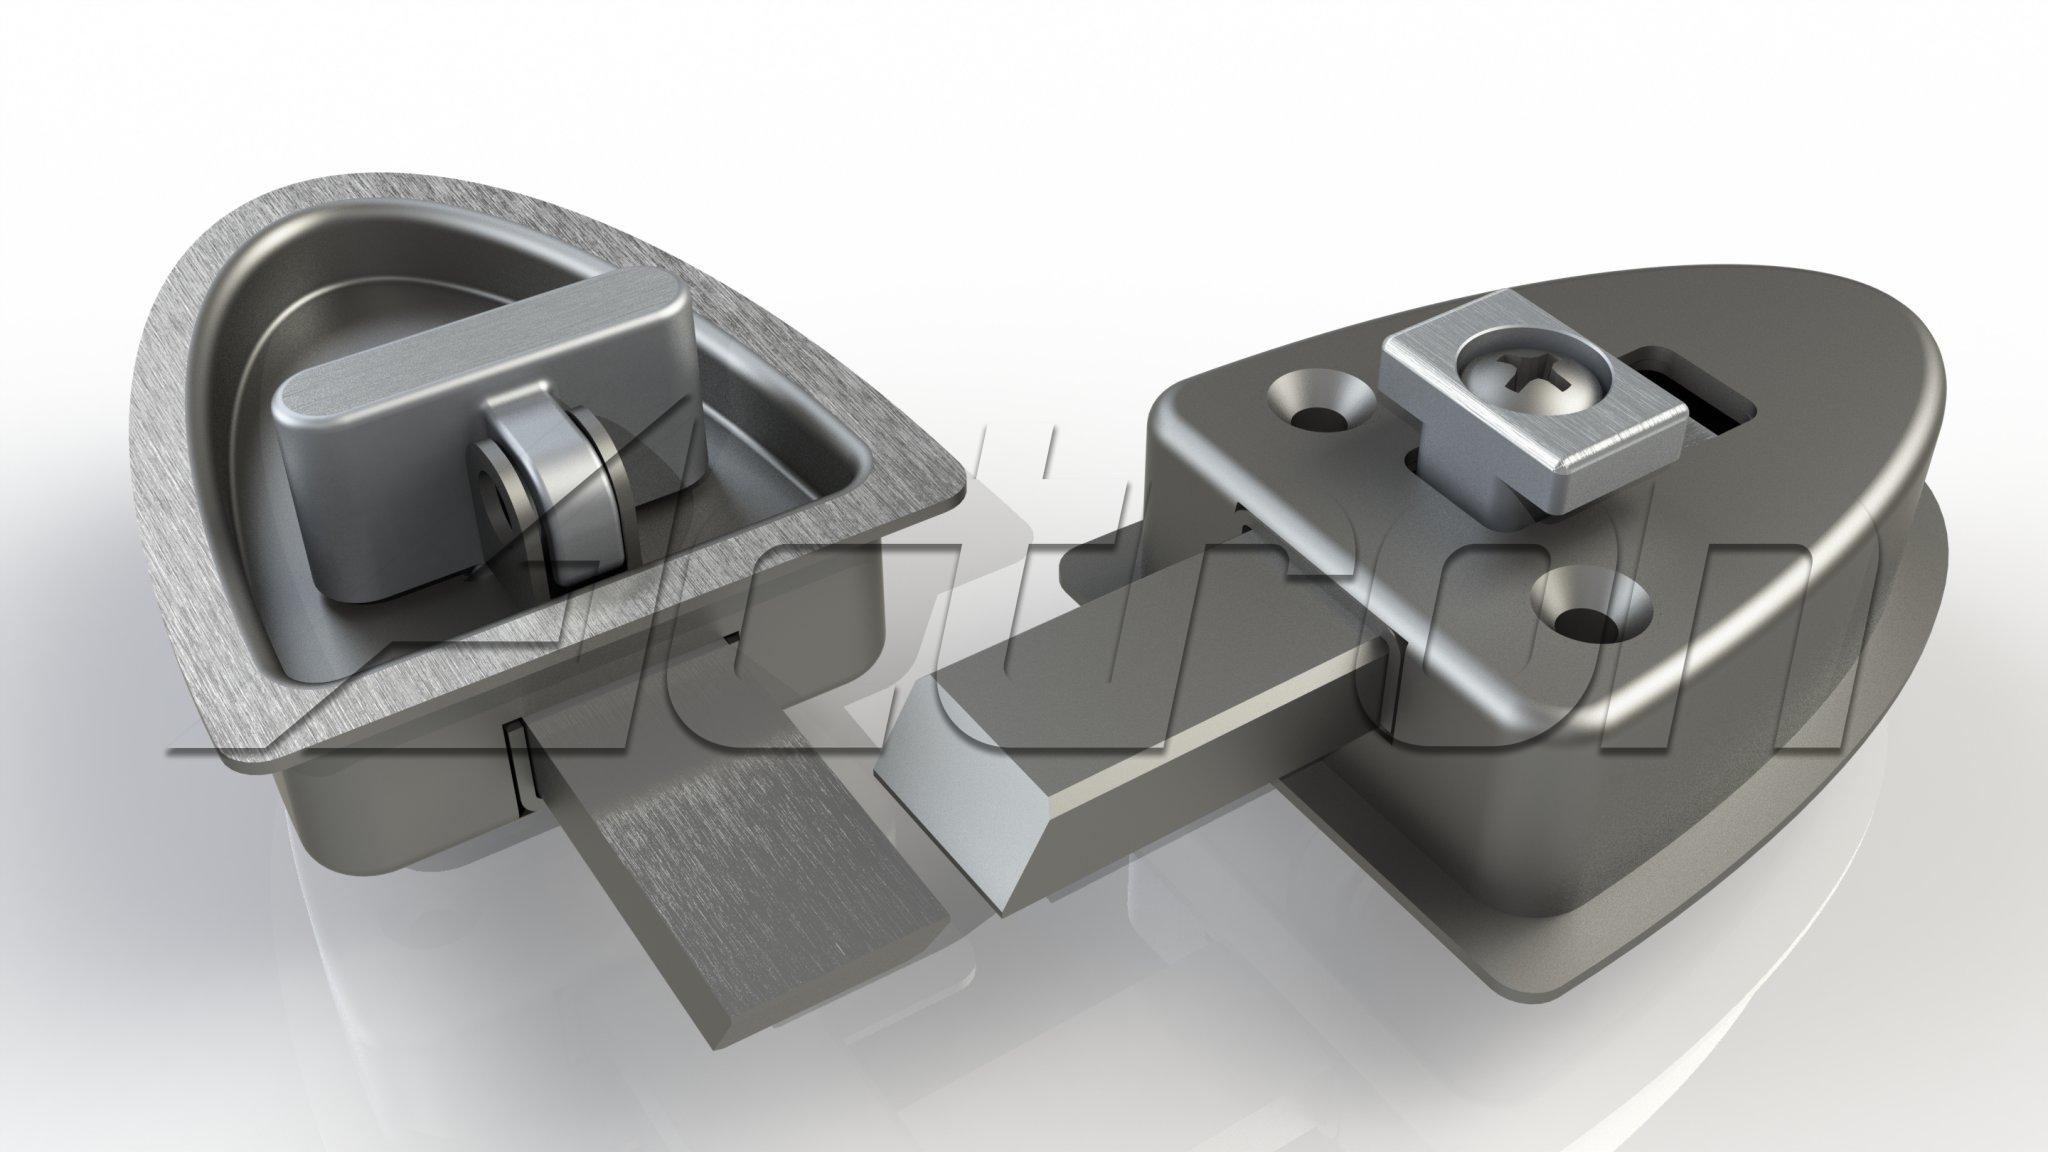 latch-assy-8211-sliding-4456-a27386.jpg